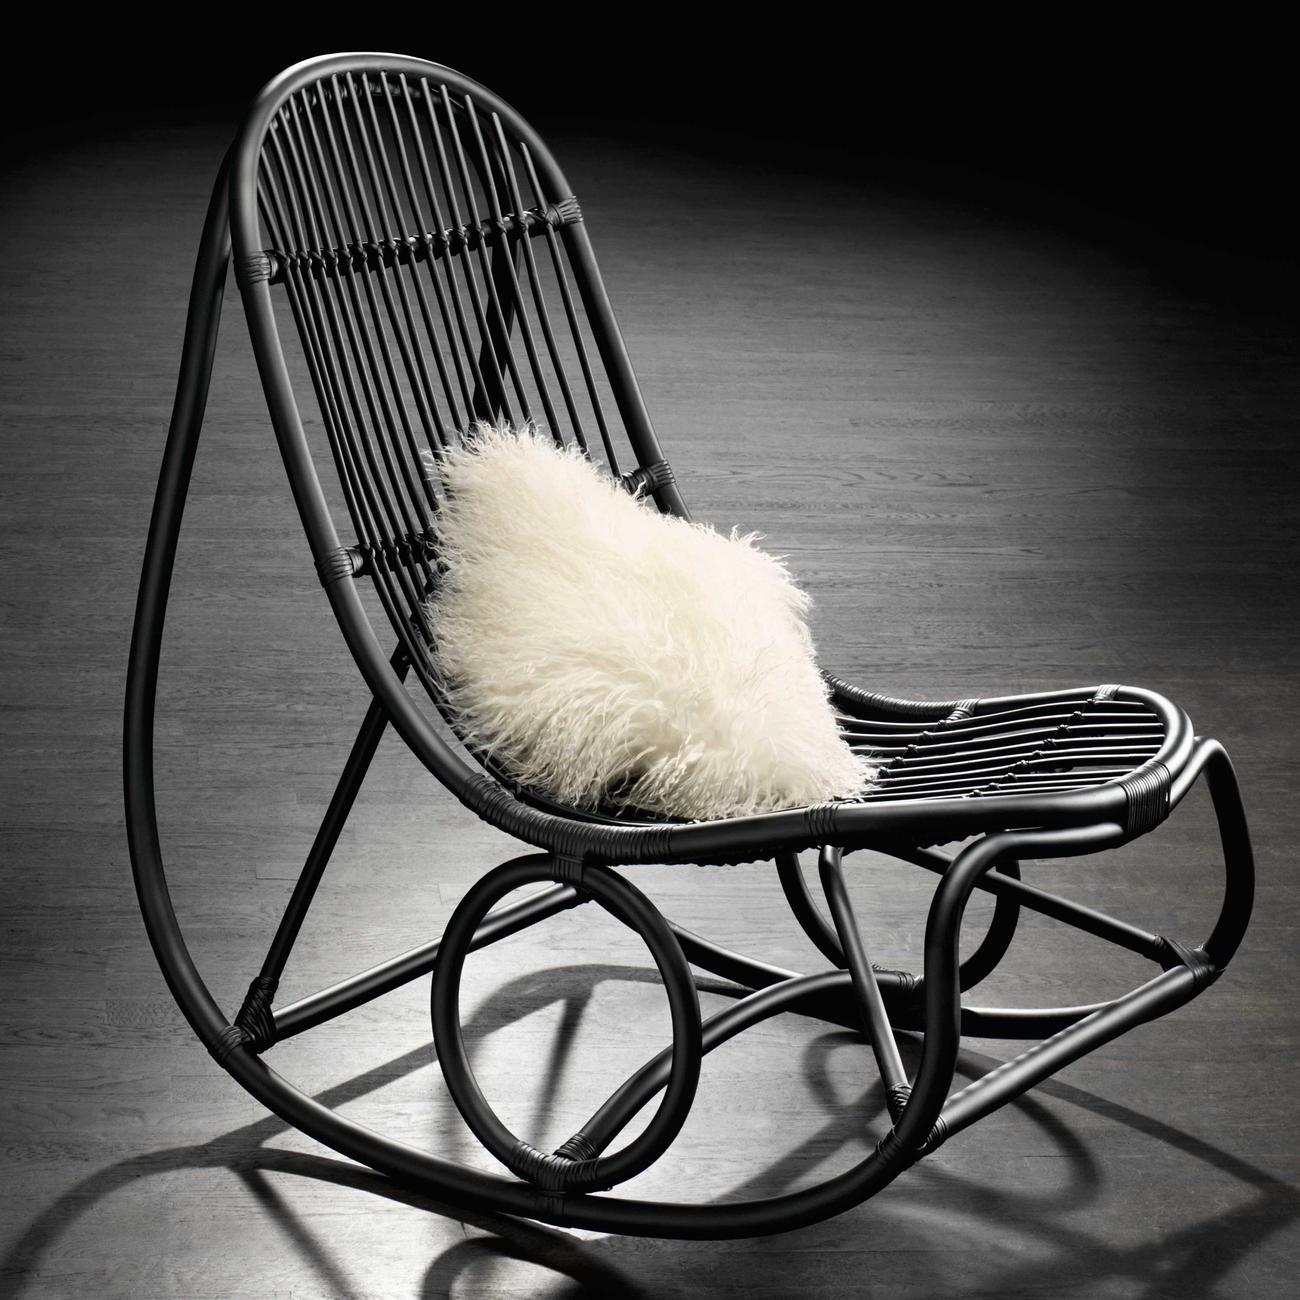 schaukelstuhl nanny 3 jahre garantie pro idee. Black Bedroom Furniture Sets. Home Design Ideas